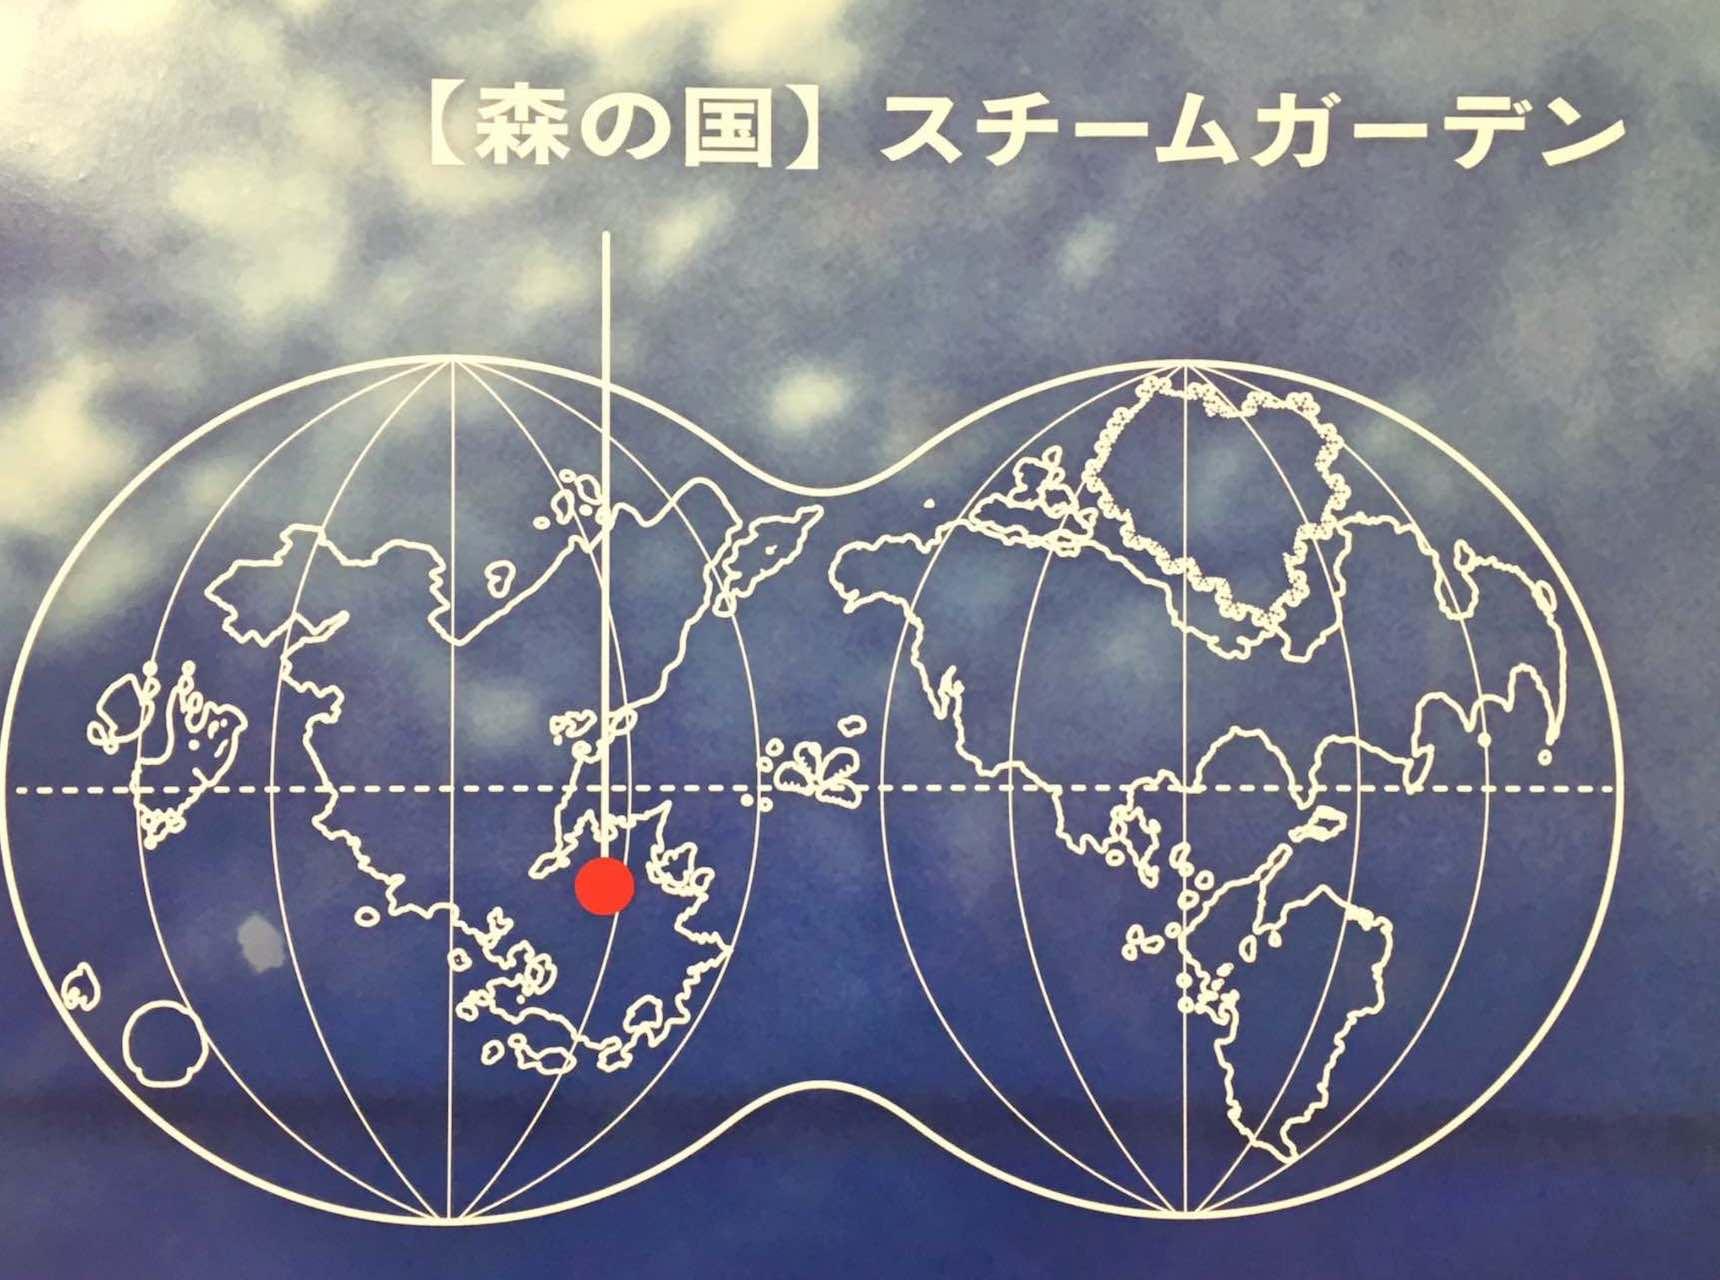 super-mario-odyssey-world-map